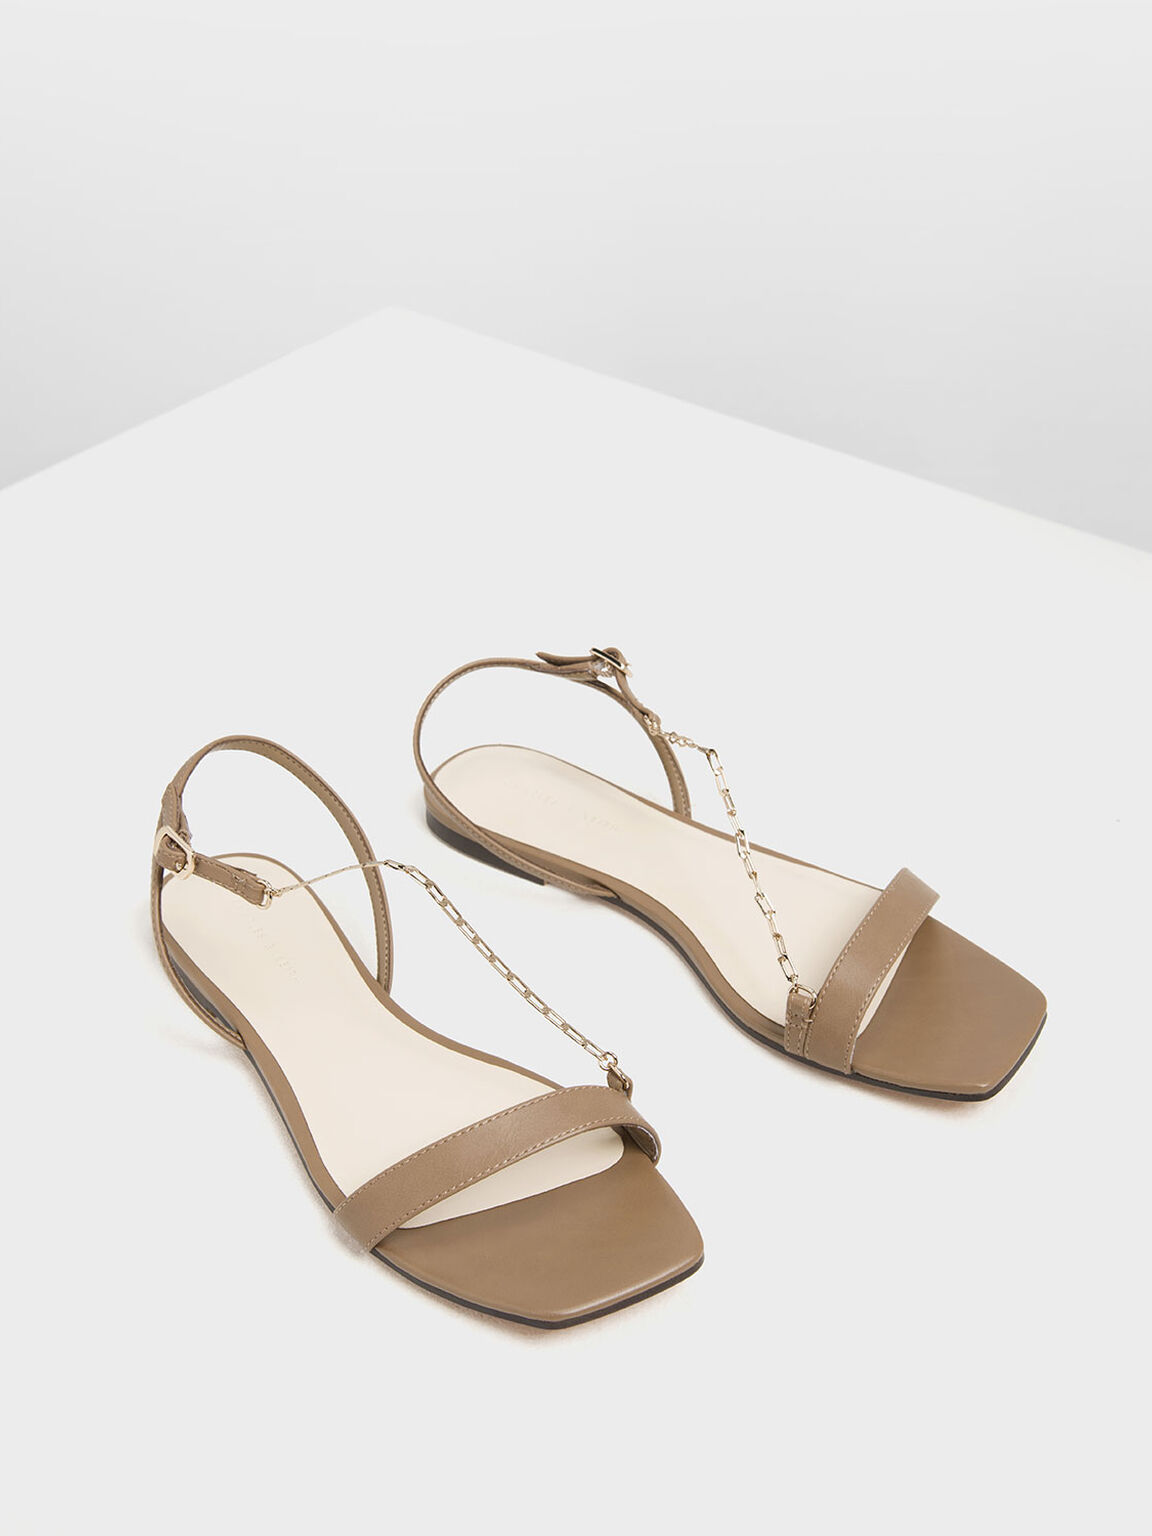 Chain Strap Sandals, Brown, hi-res